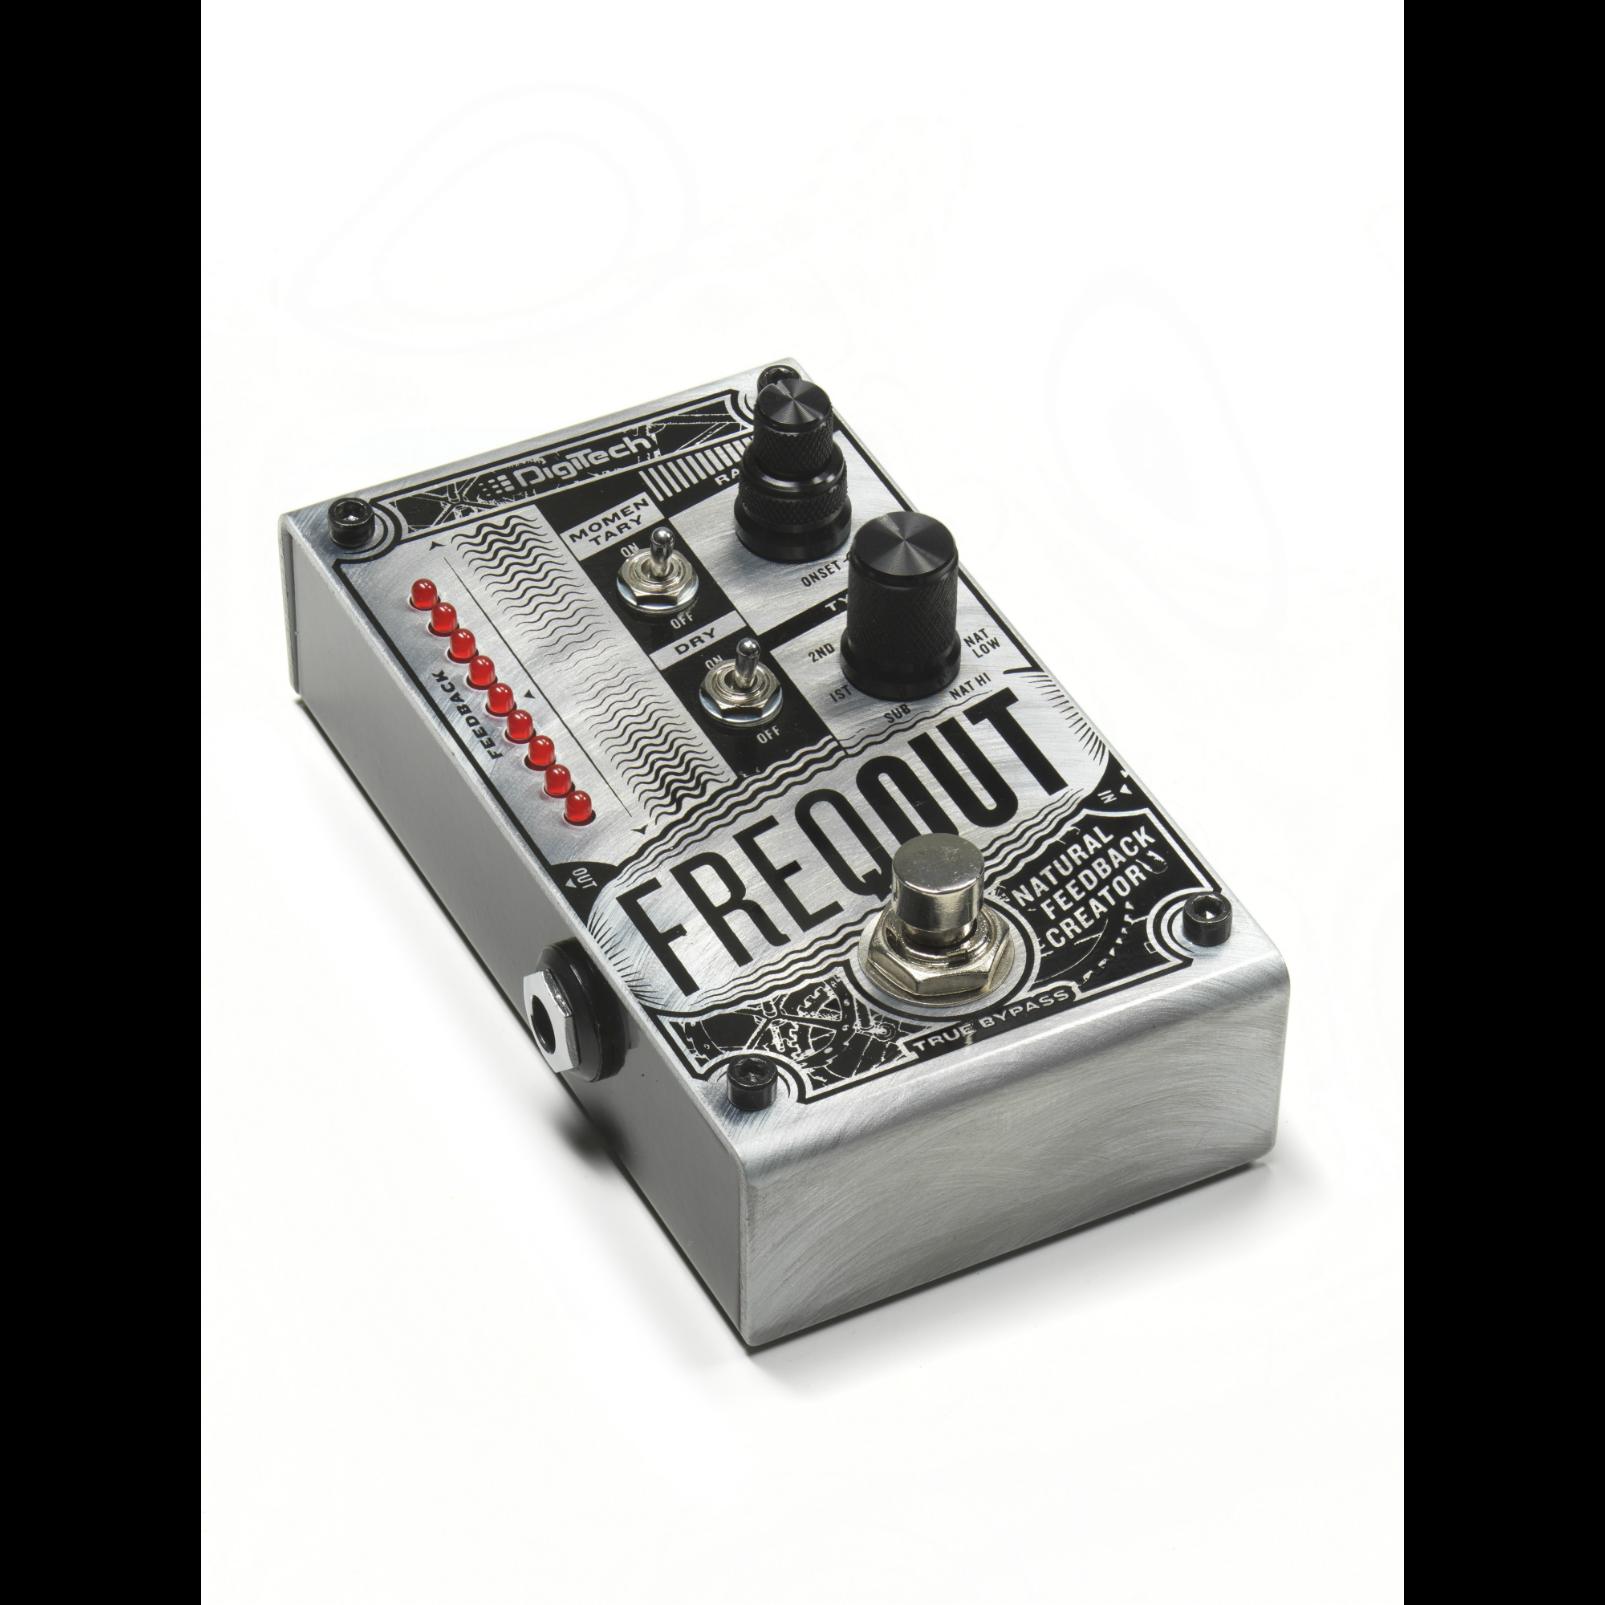 FreqOut - Silver - Natural Feedback Creator - Detailshot 1